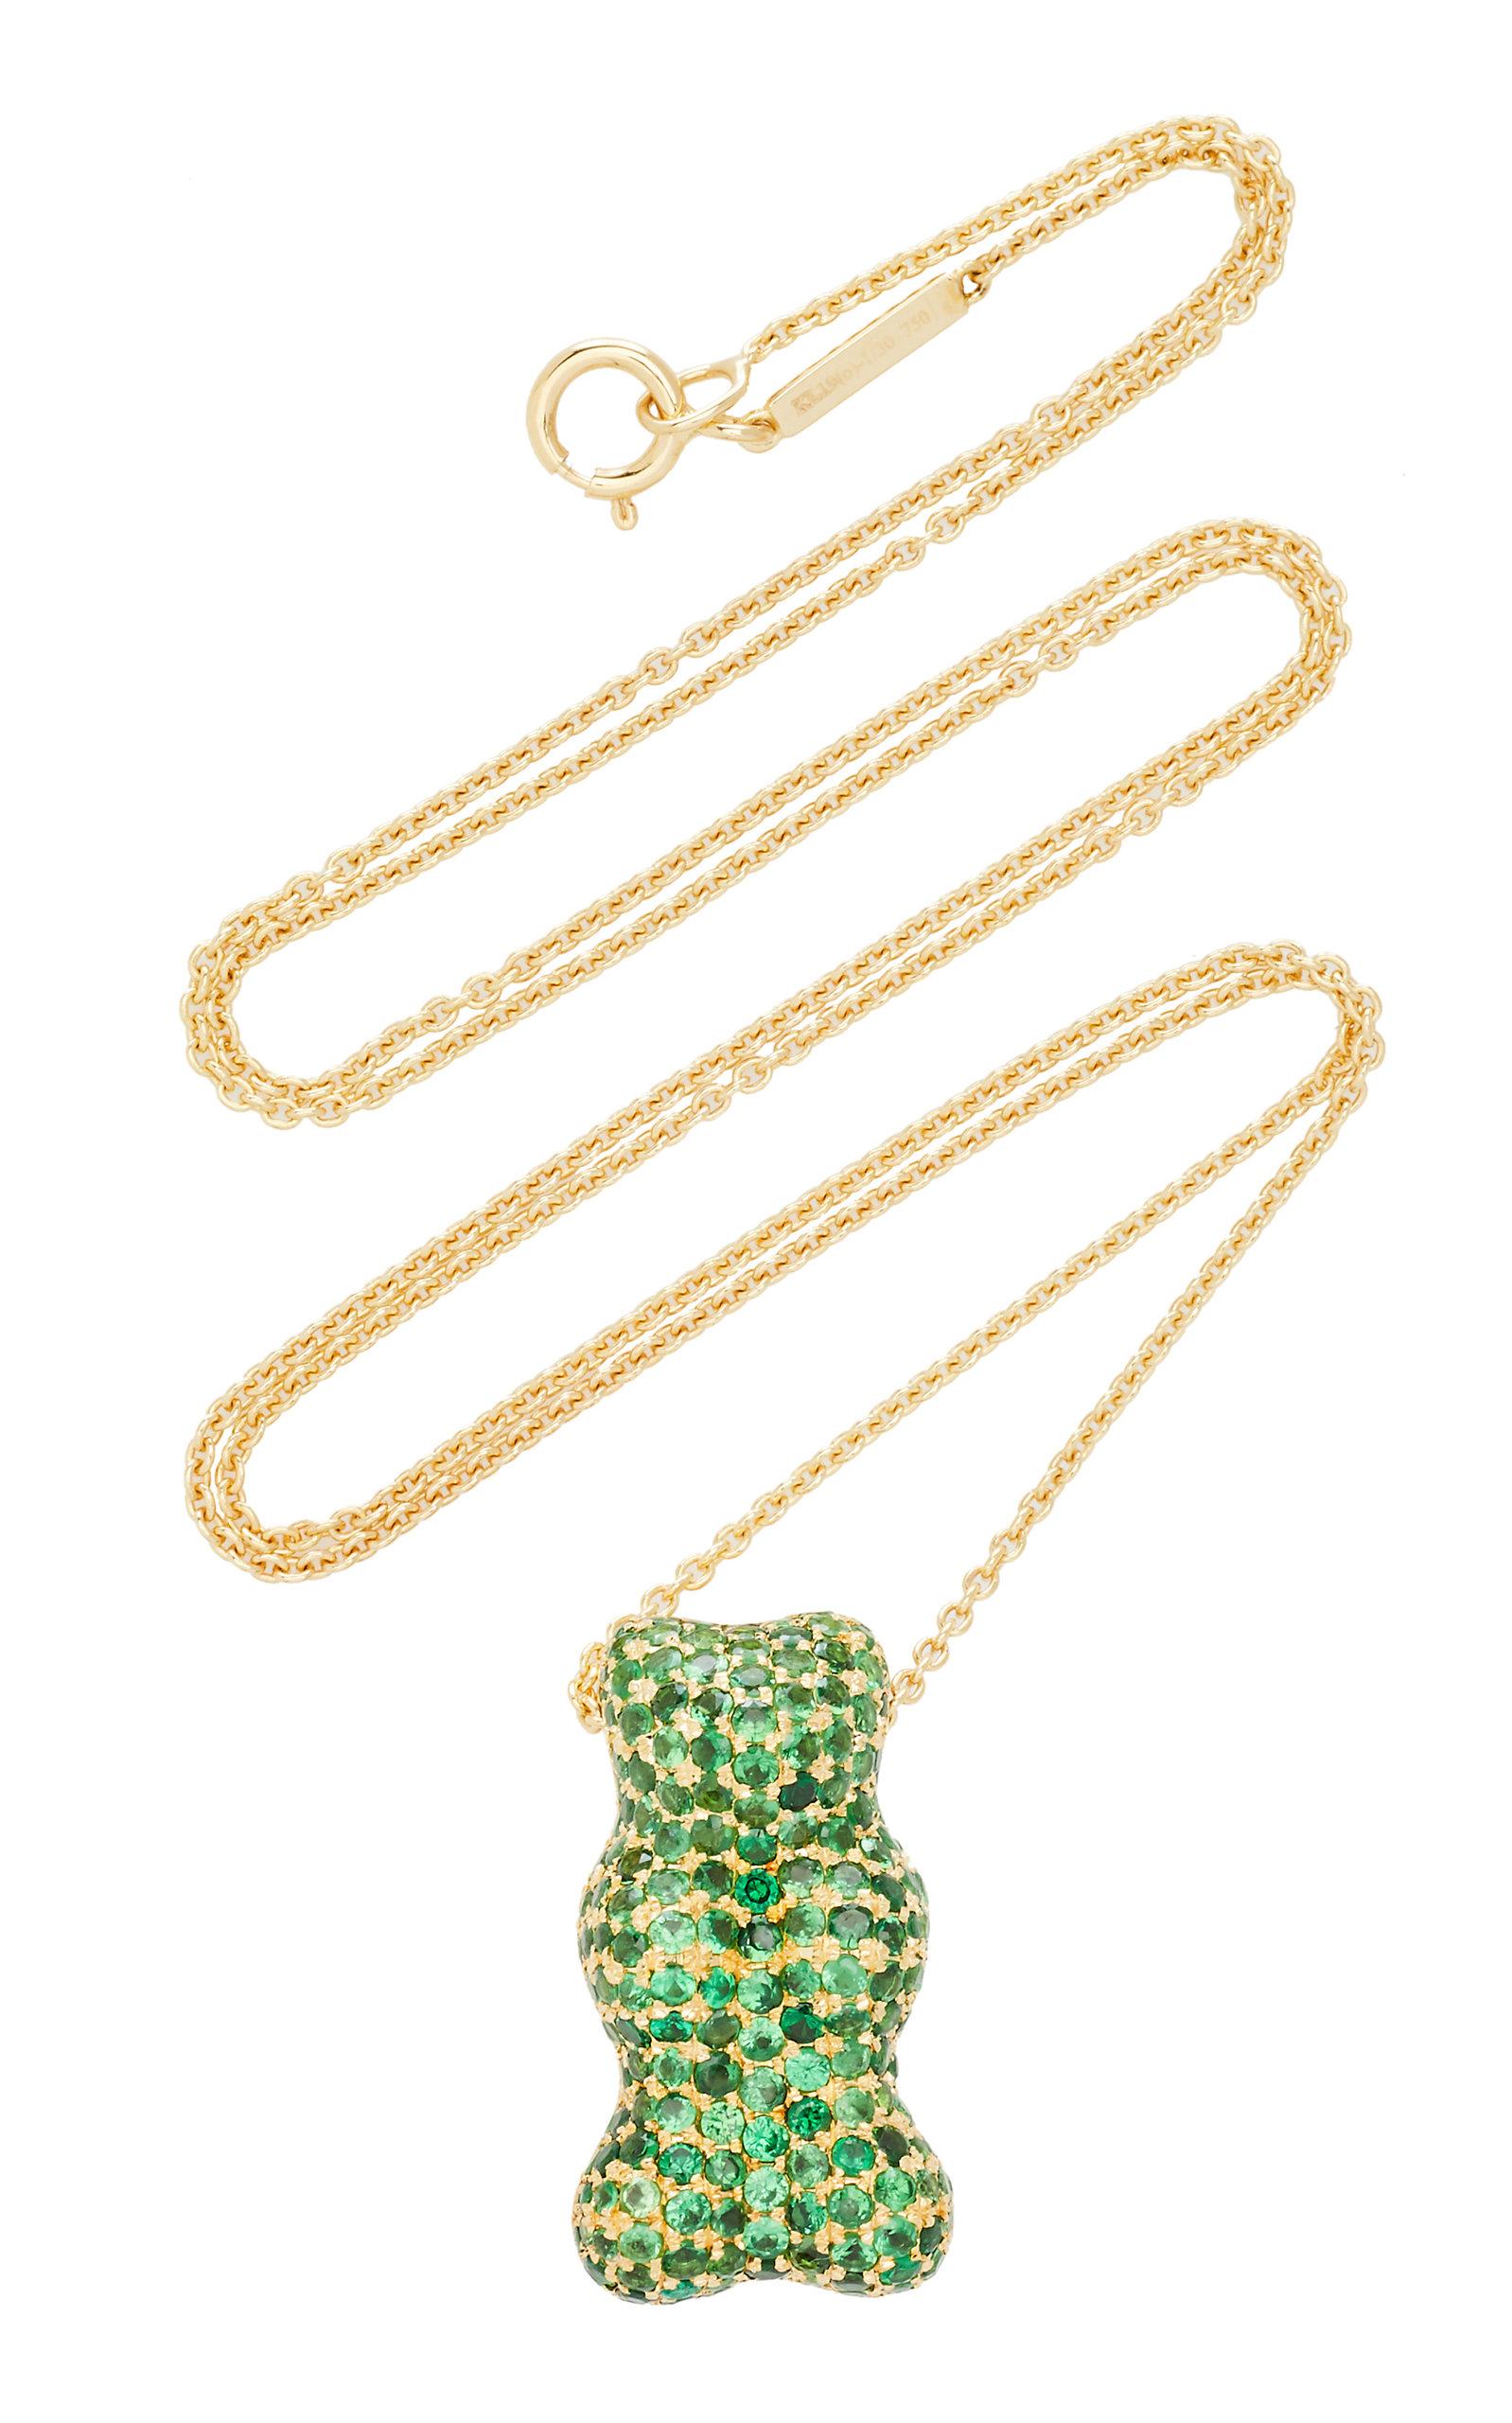 Women's Tsavorite-Embellished Gummy Bear 18K Yellow-Gold Necklace